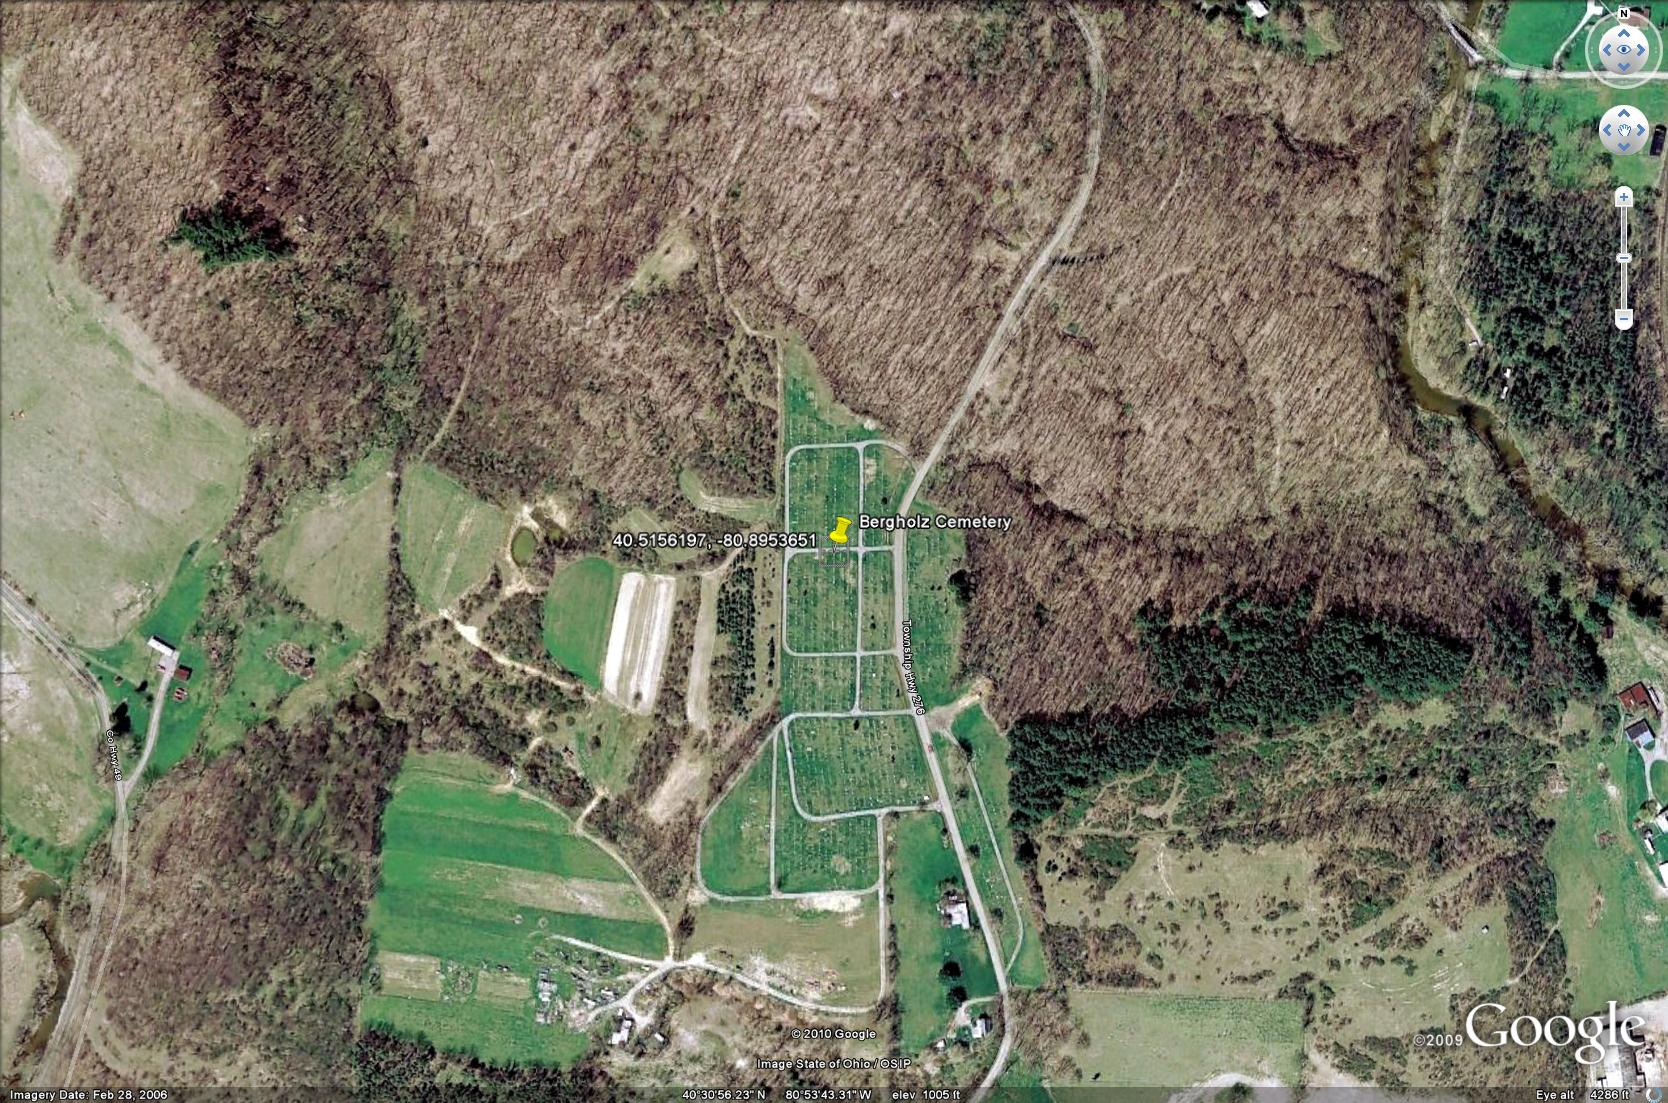 Ohio jefferson county bergholz - Bergholz Cemetery Kearn Miller Hendrix Farm Private